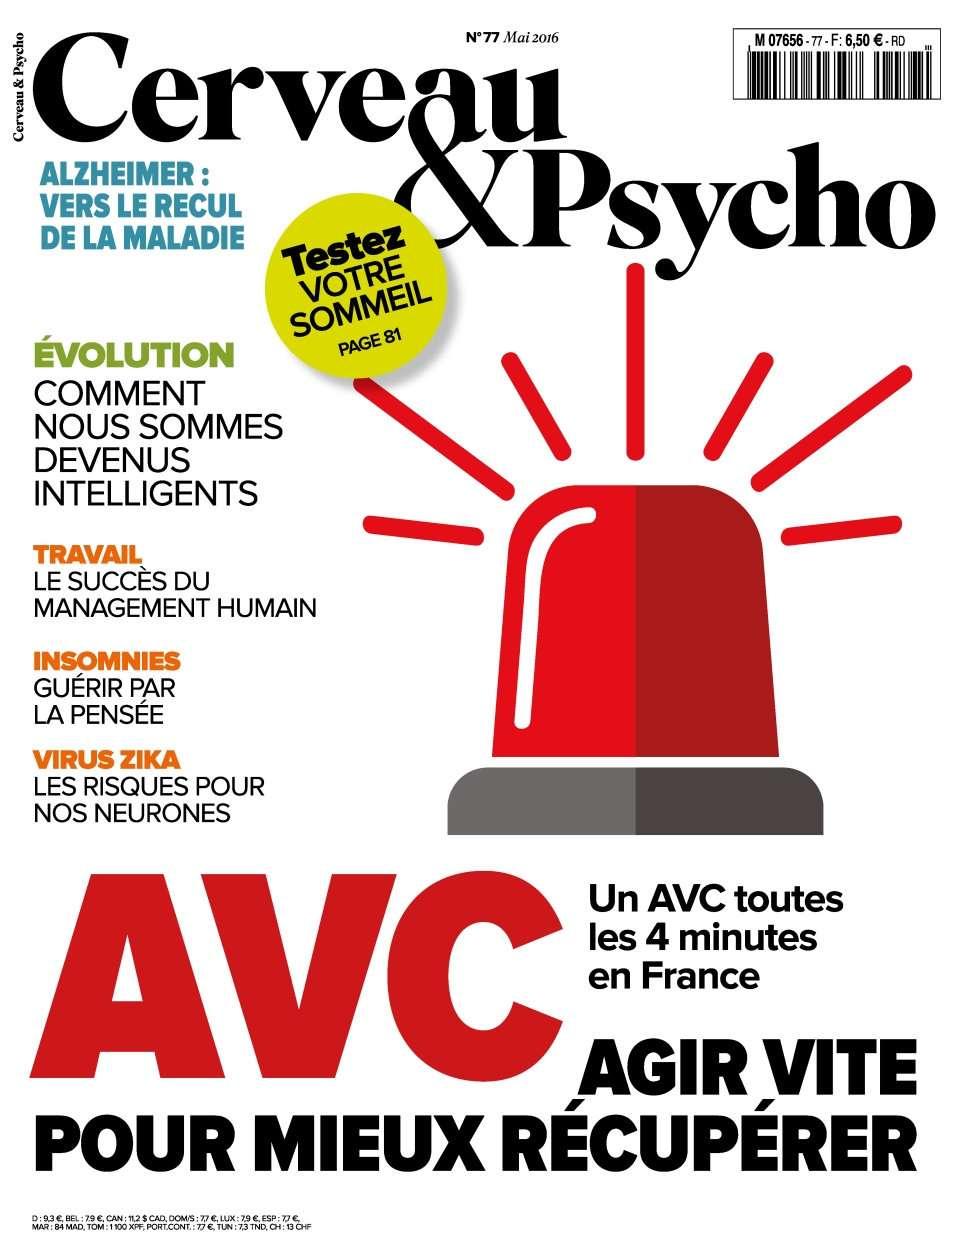 Cerveau & Psycho 77 - Mai 2016